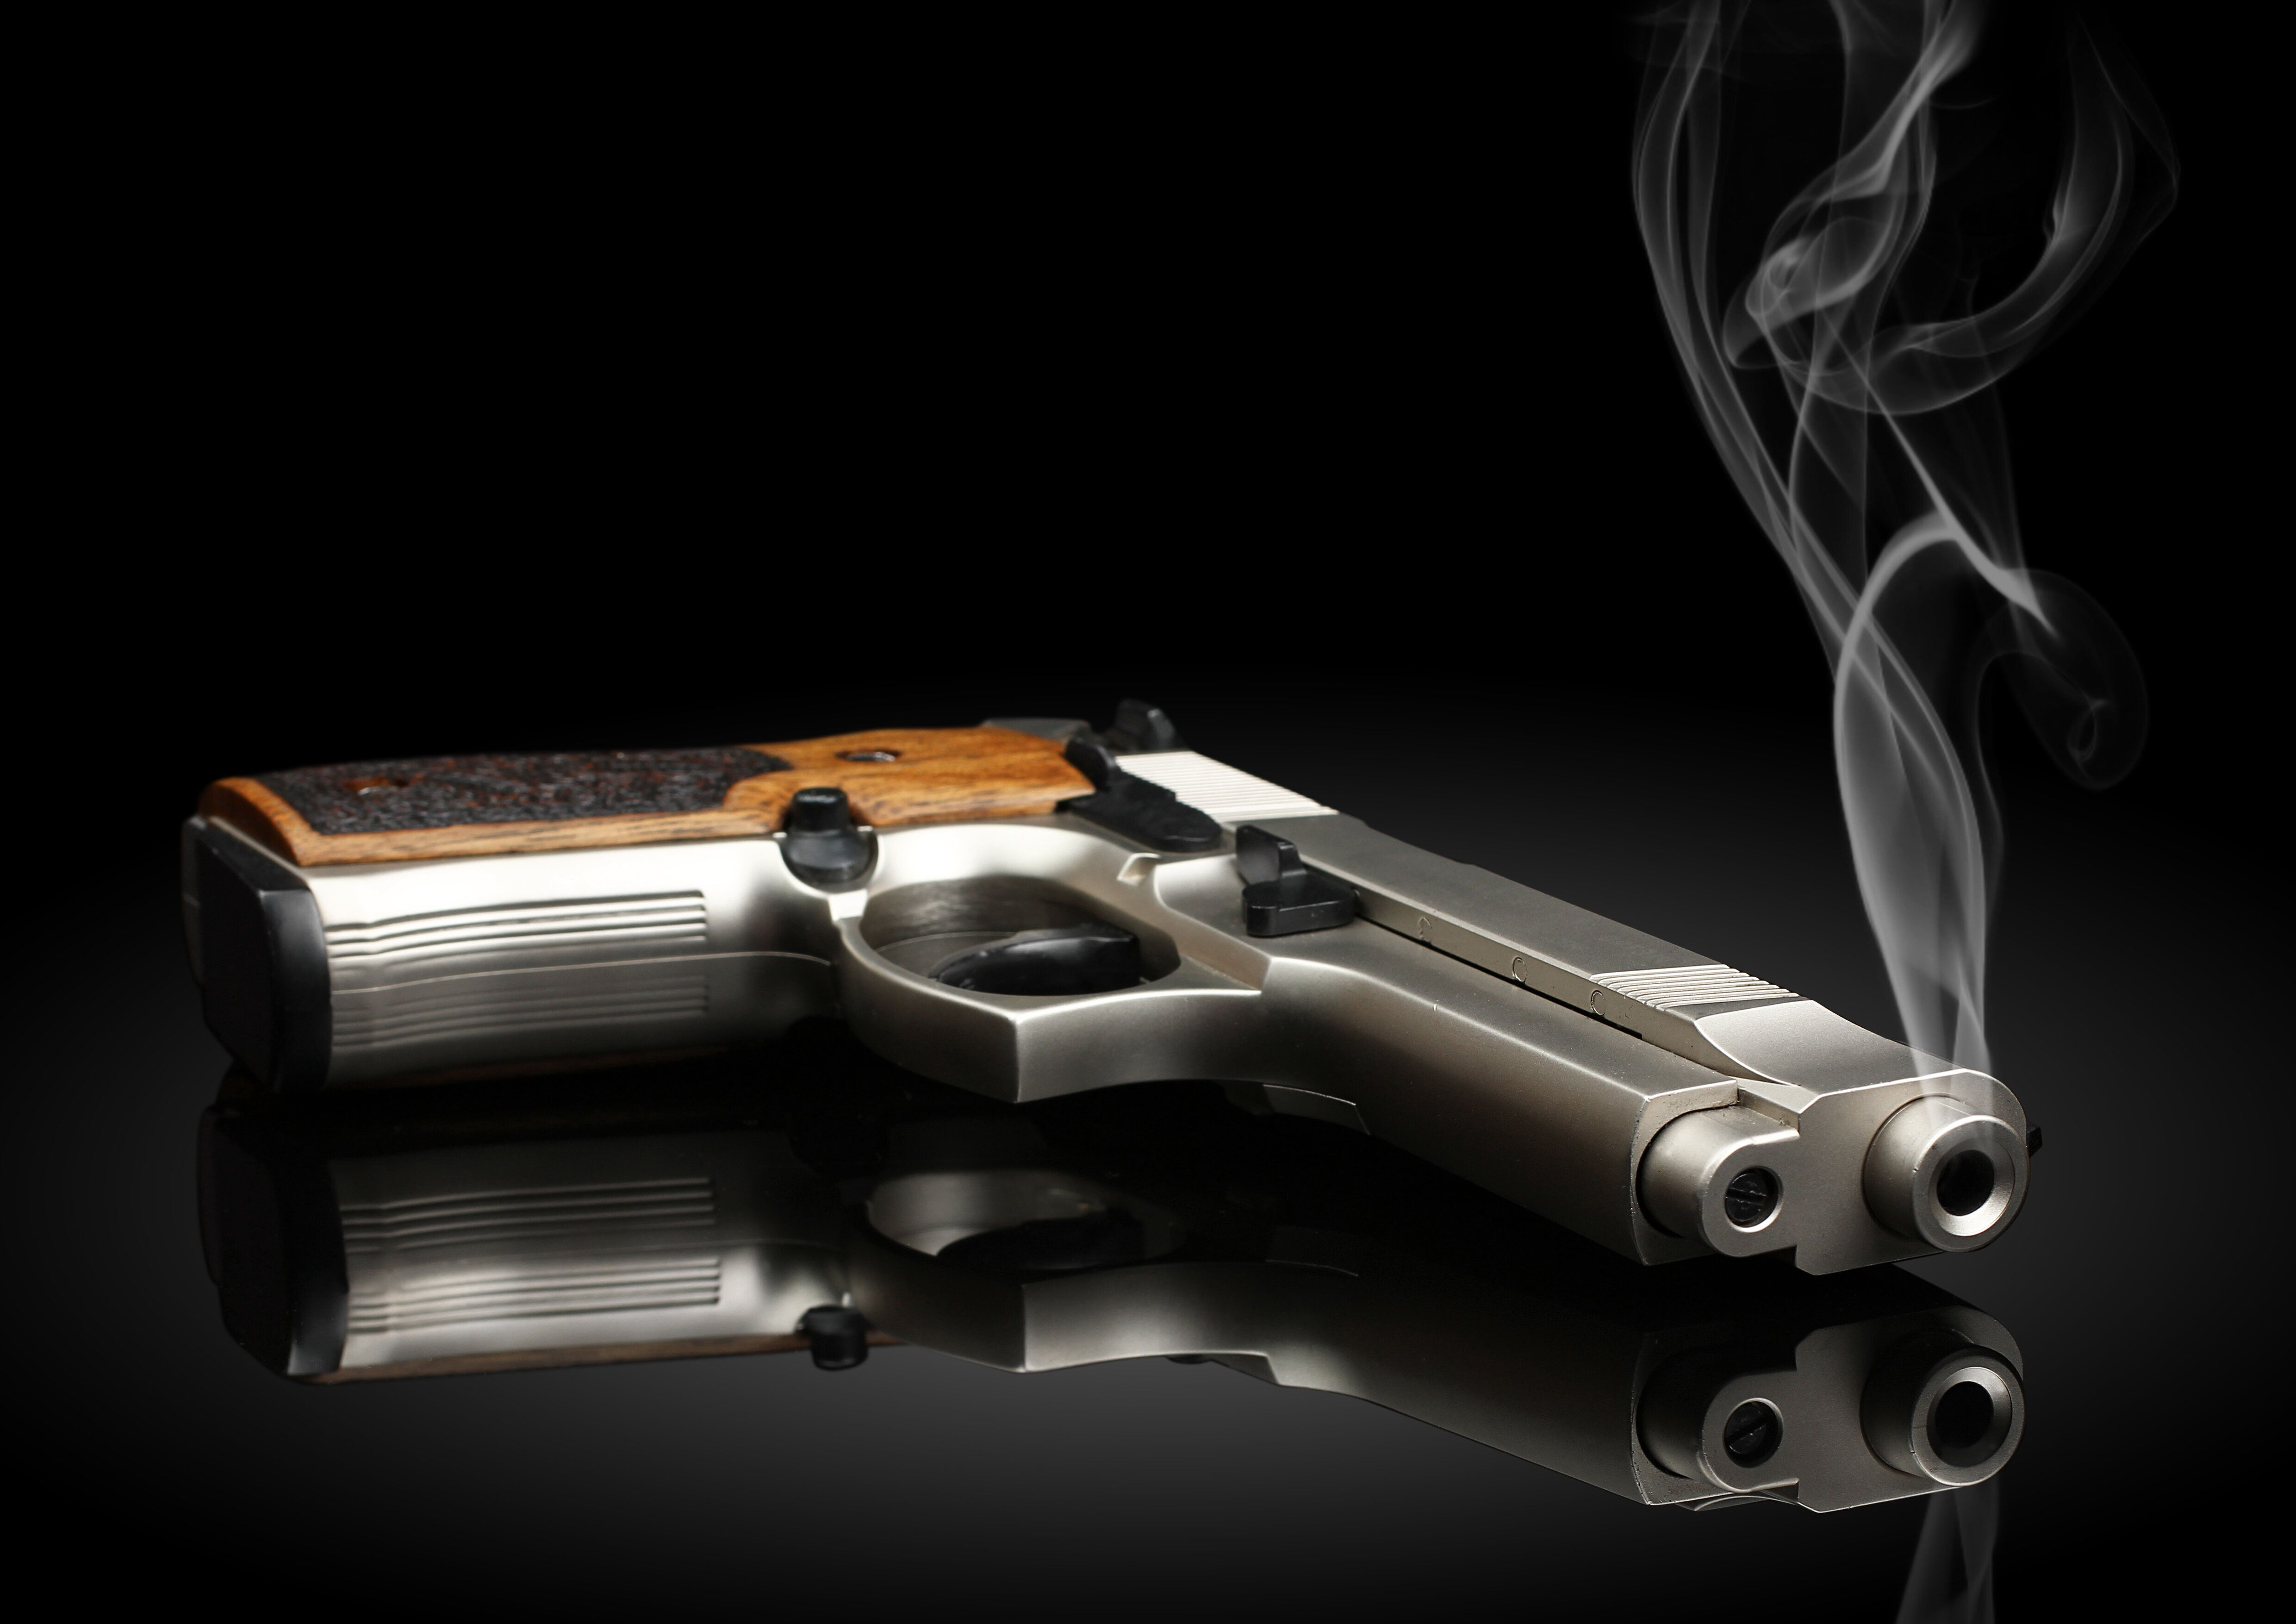 Chromed handgun on black background with smoke